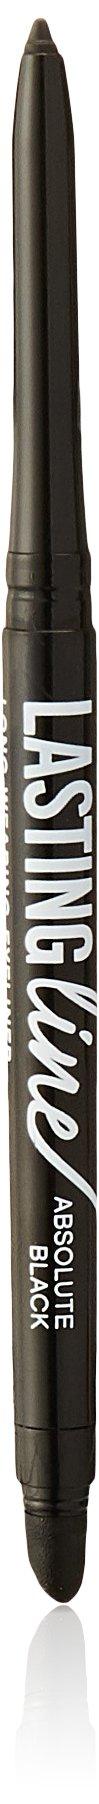 bareMinerals Long Lasting Eyeliner, Absolute Black, 0.012 Ounce